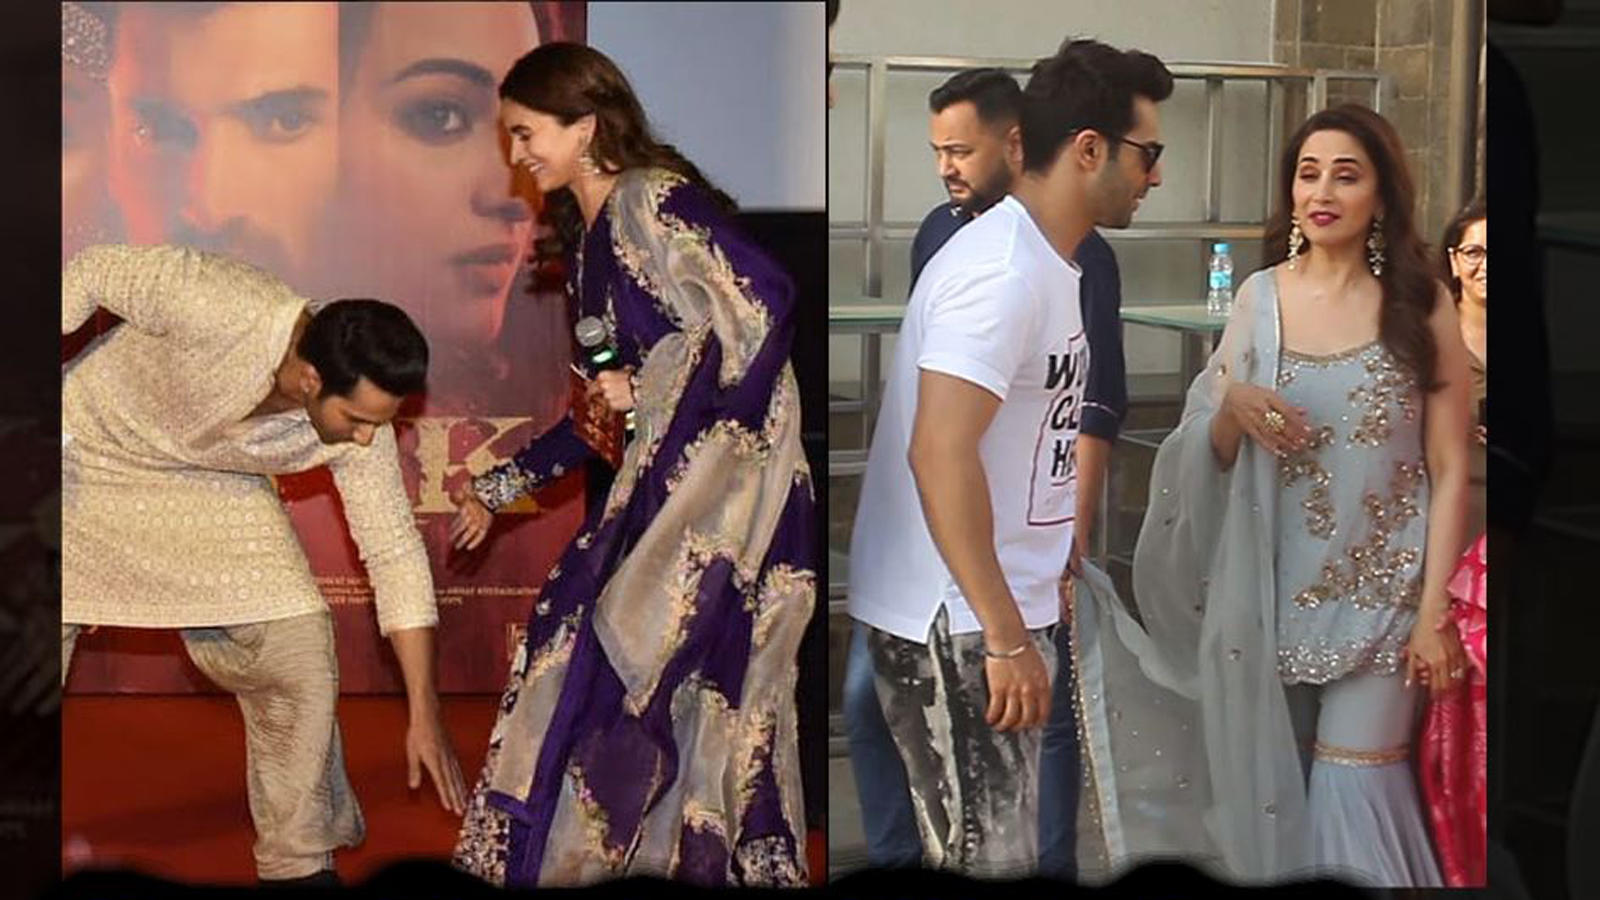 Funny! Varun Dhawan touches Alia Bhatt's feet and holds Madhuri Dixit's dupatta